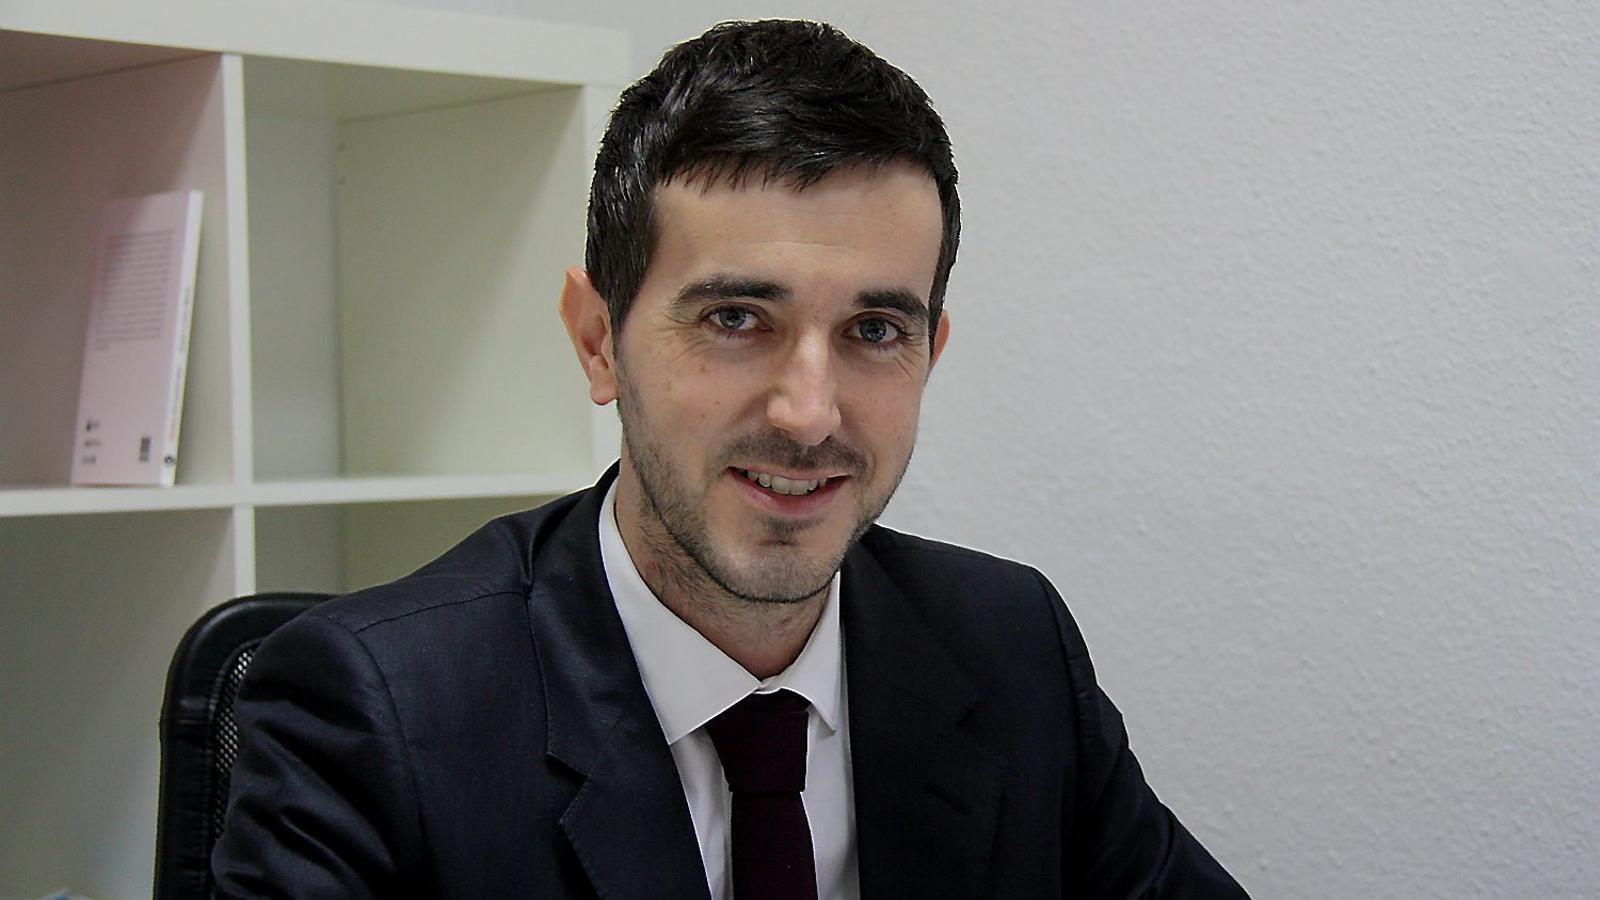 Miquel Martín Gamisans